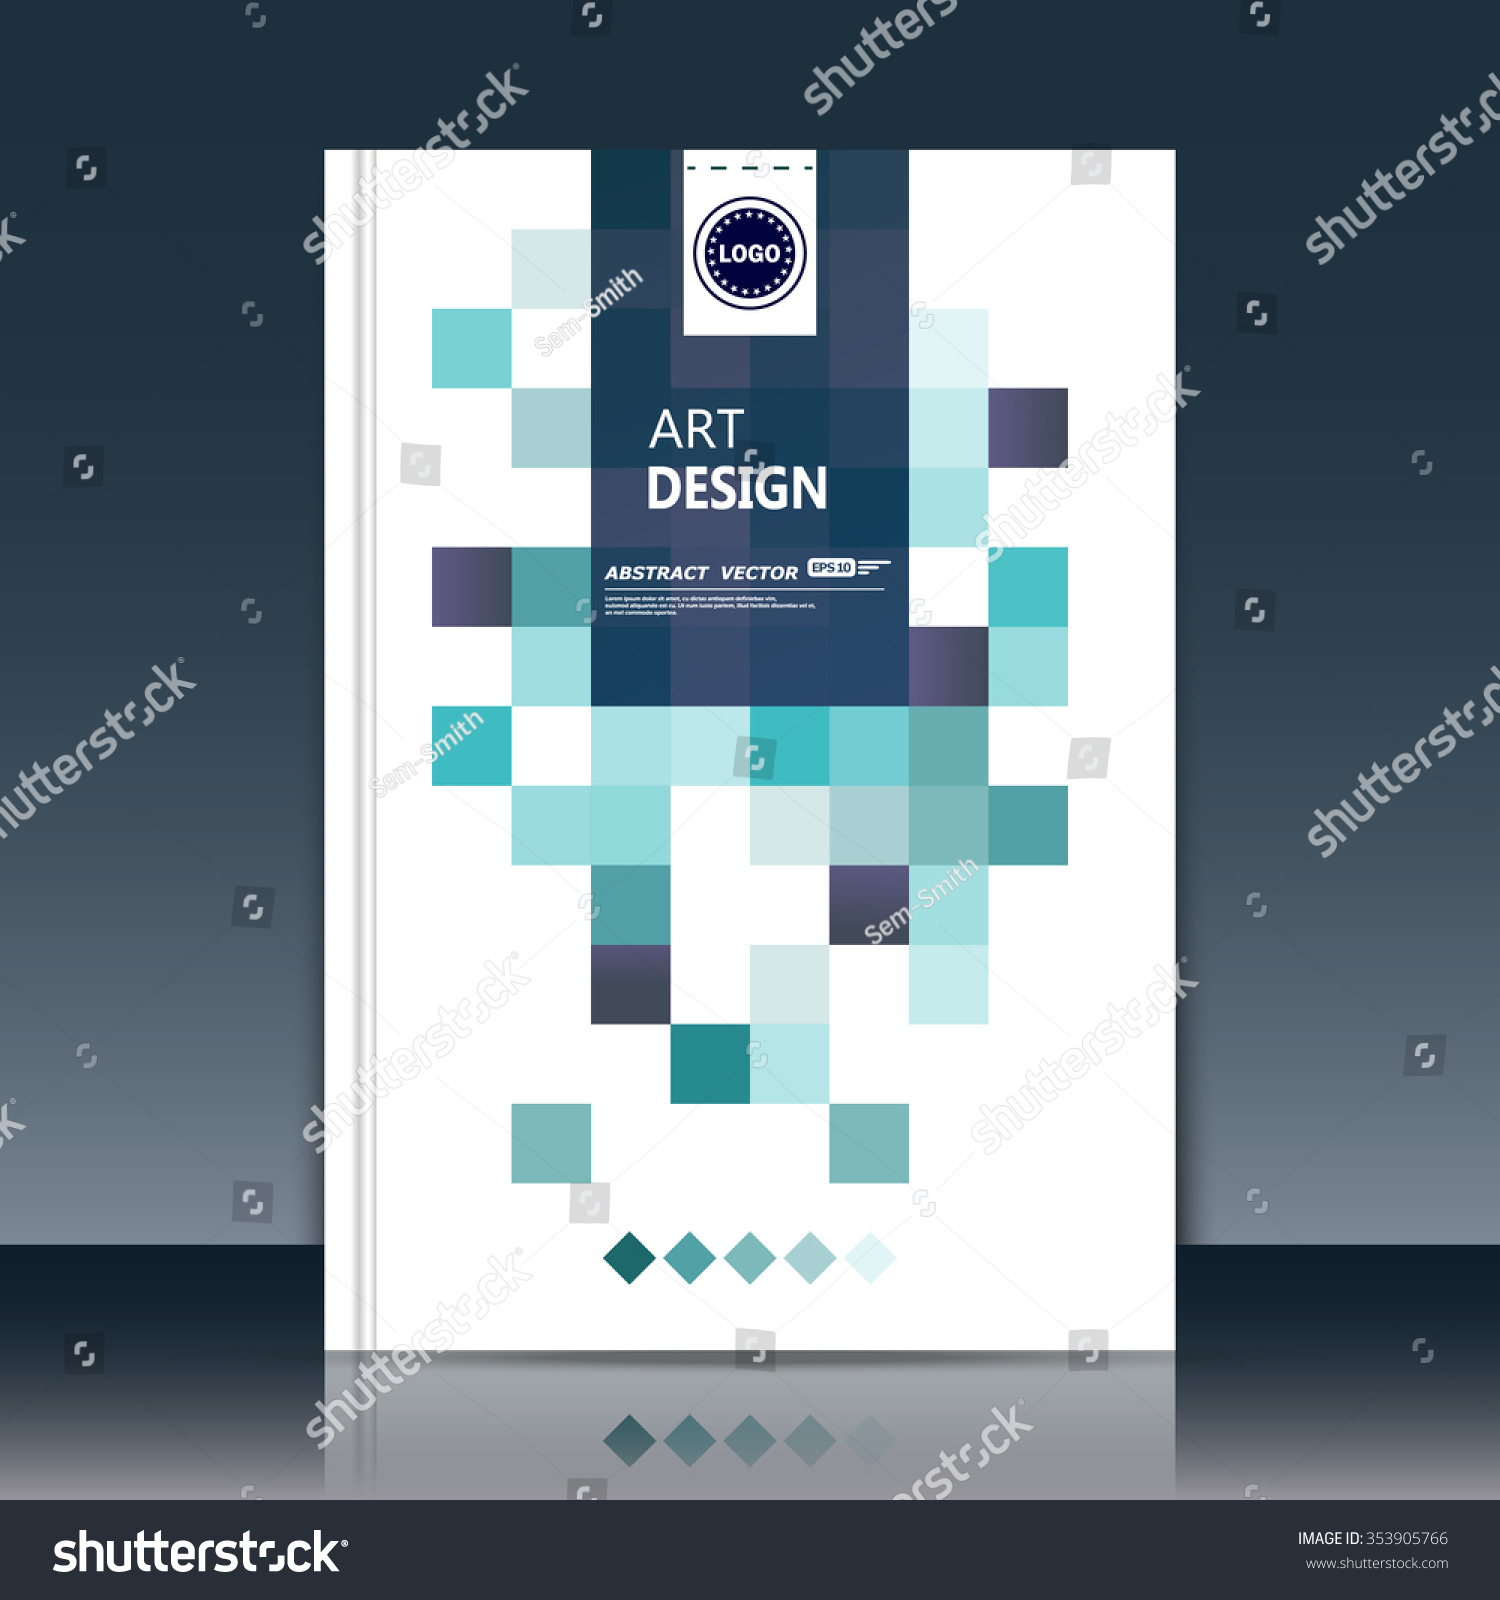 Abstract Composition Green Business Card Backdrop Stock Vector ...